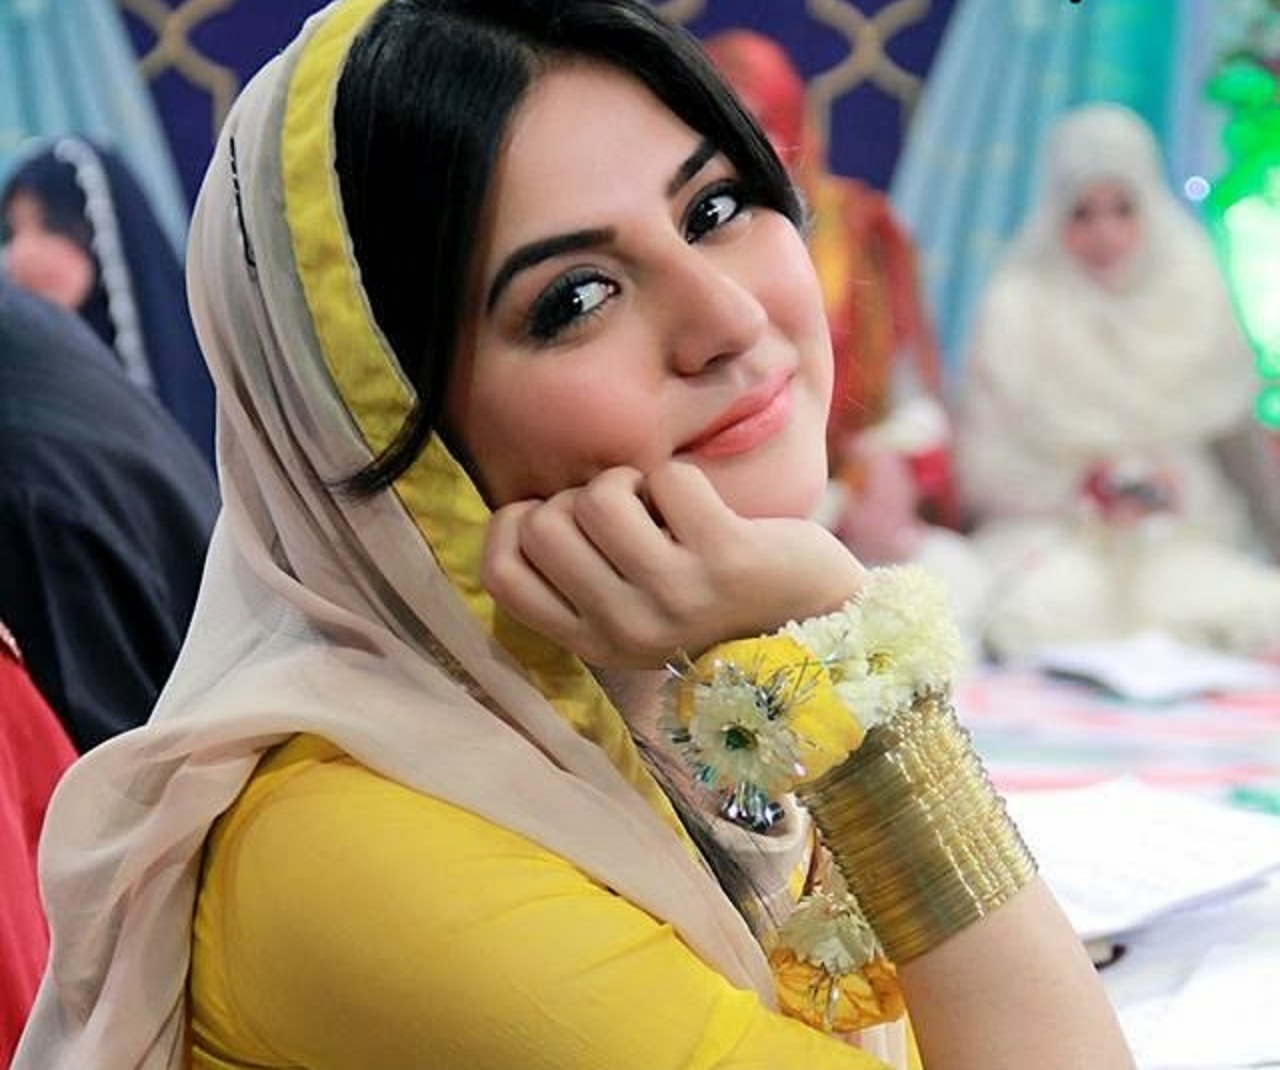 Very Cute Baby Girl Wallpapers Hd Sanam Baloch Images Hd Wallpaper All 4u Wallpaper